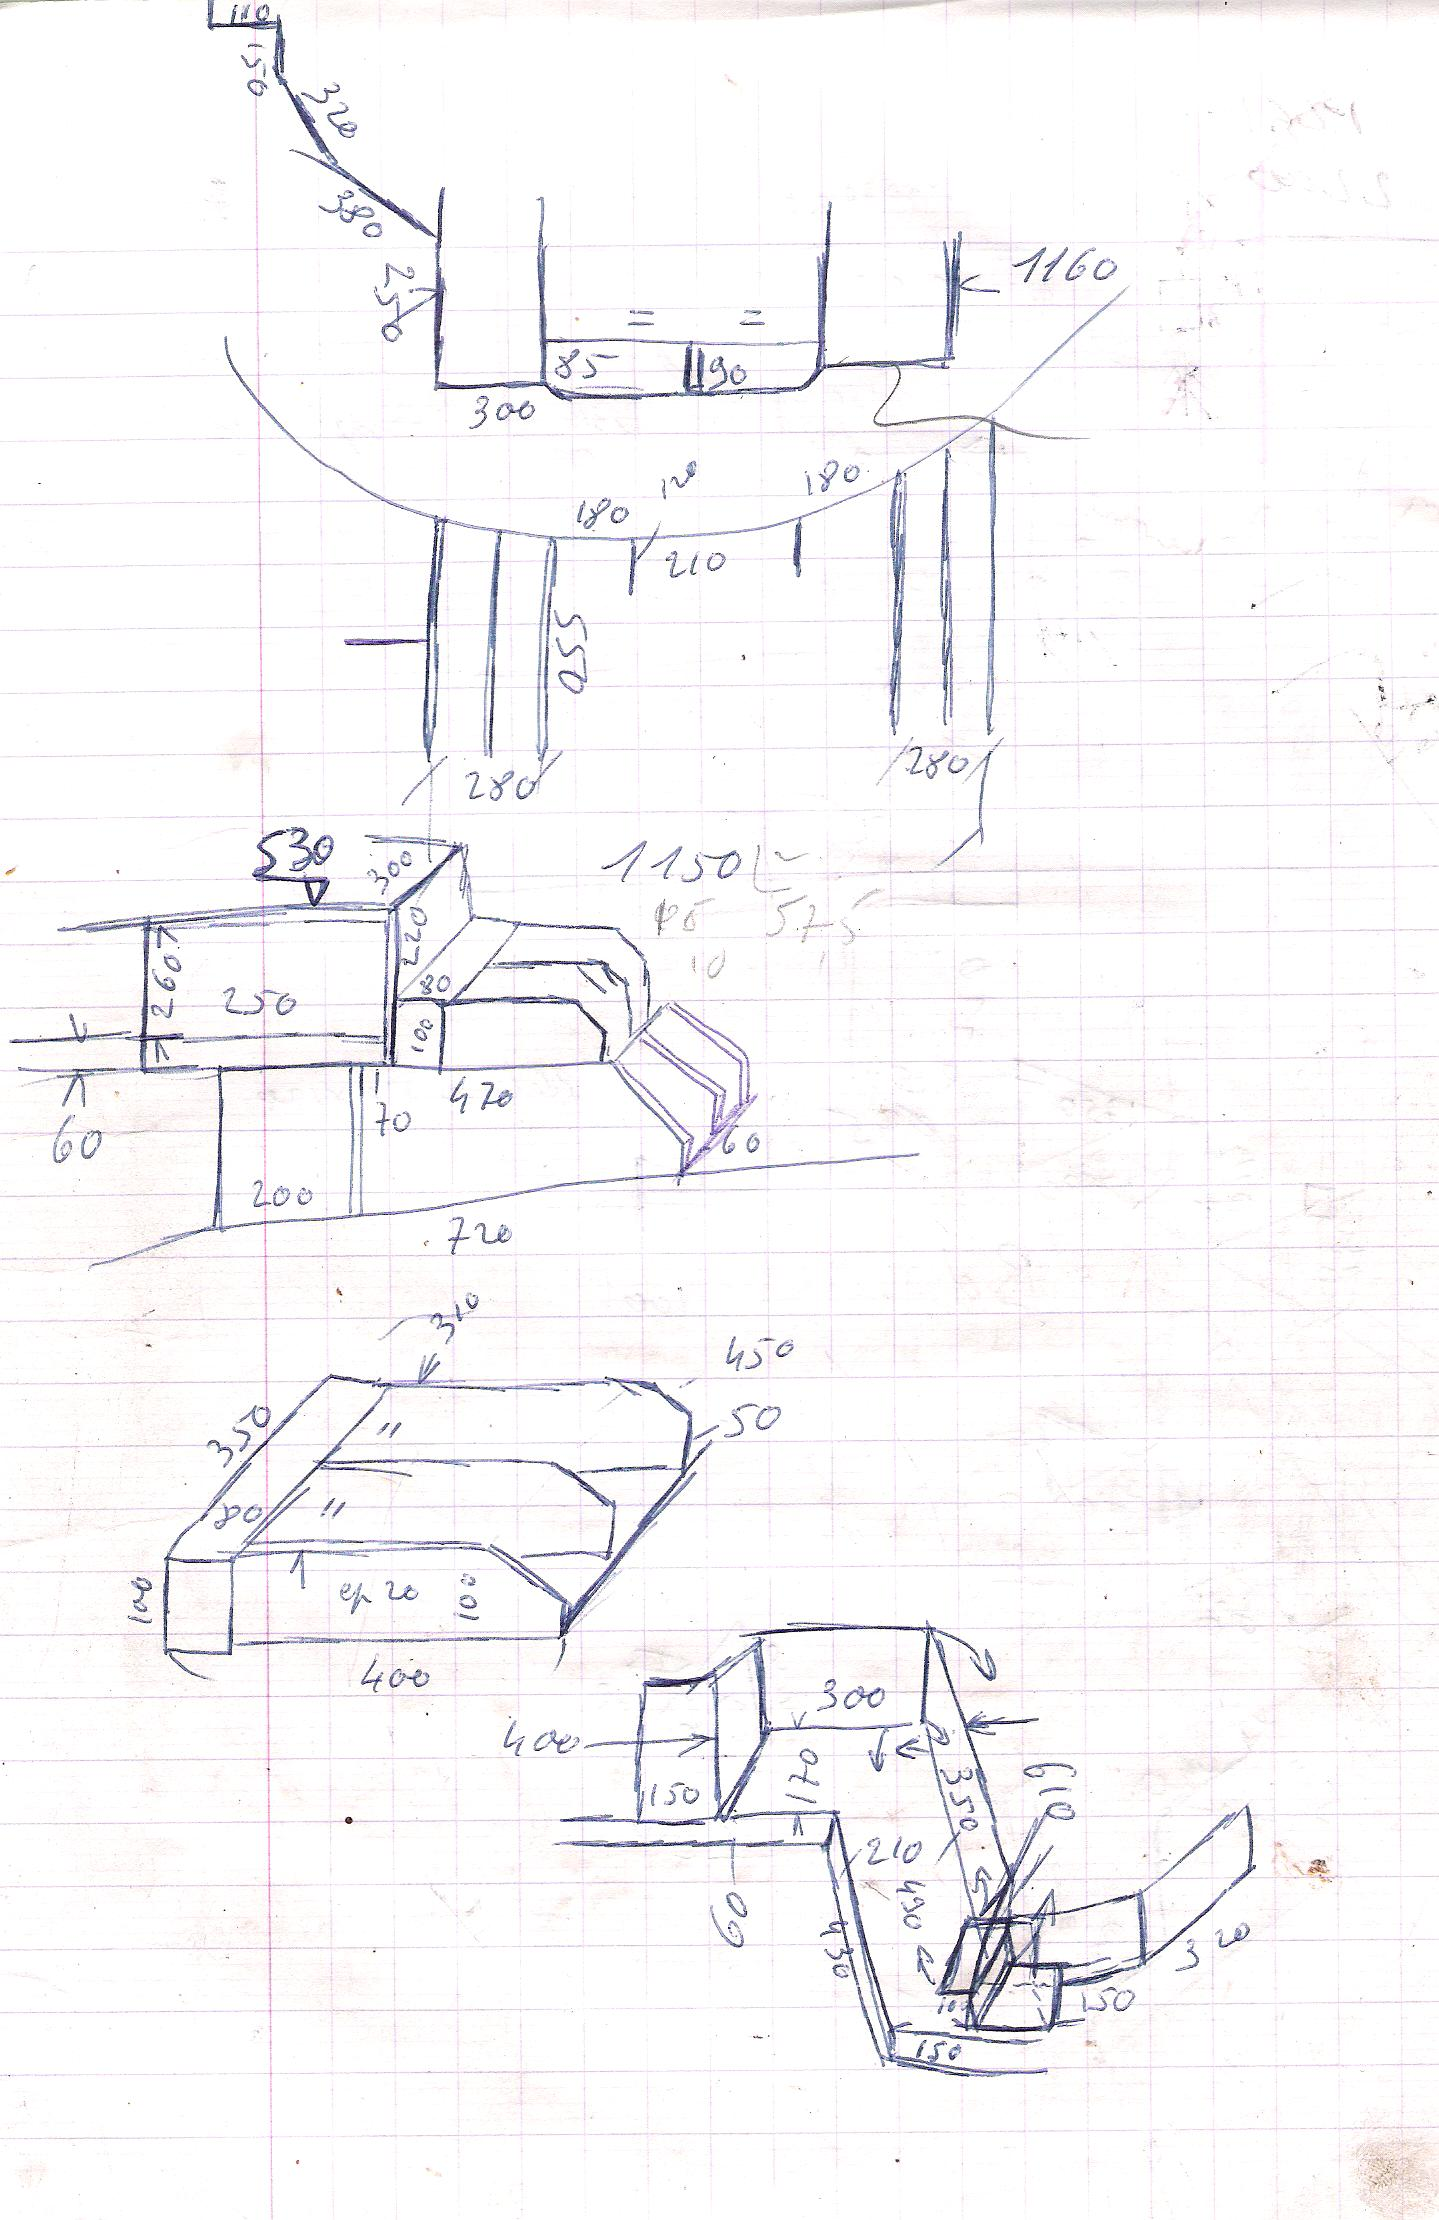 Choisir mon remorqueur (VSP tractor tug) - Page 3 151013083217607641